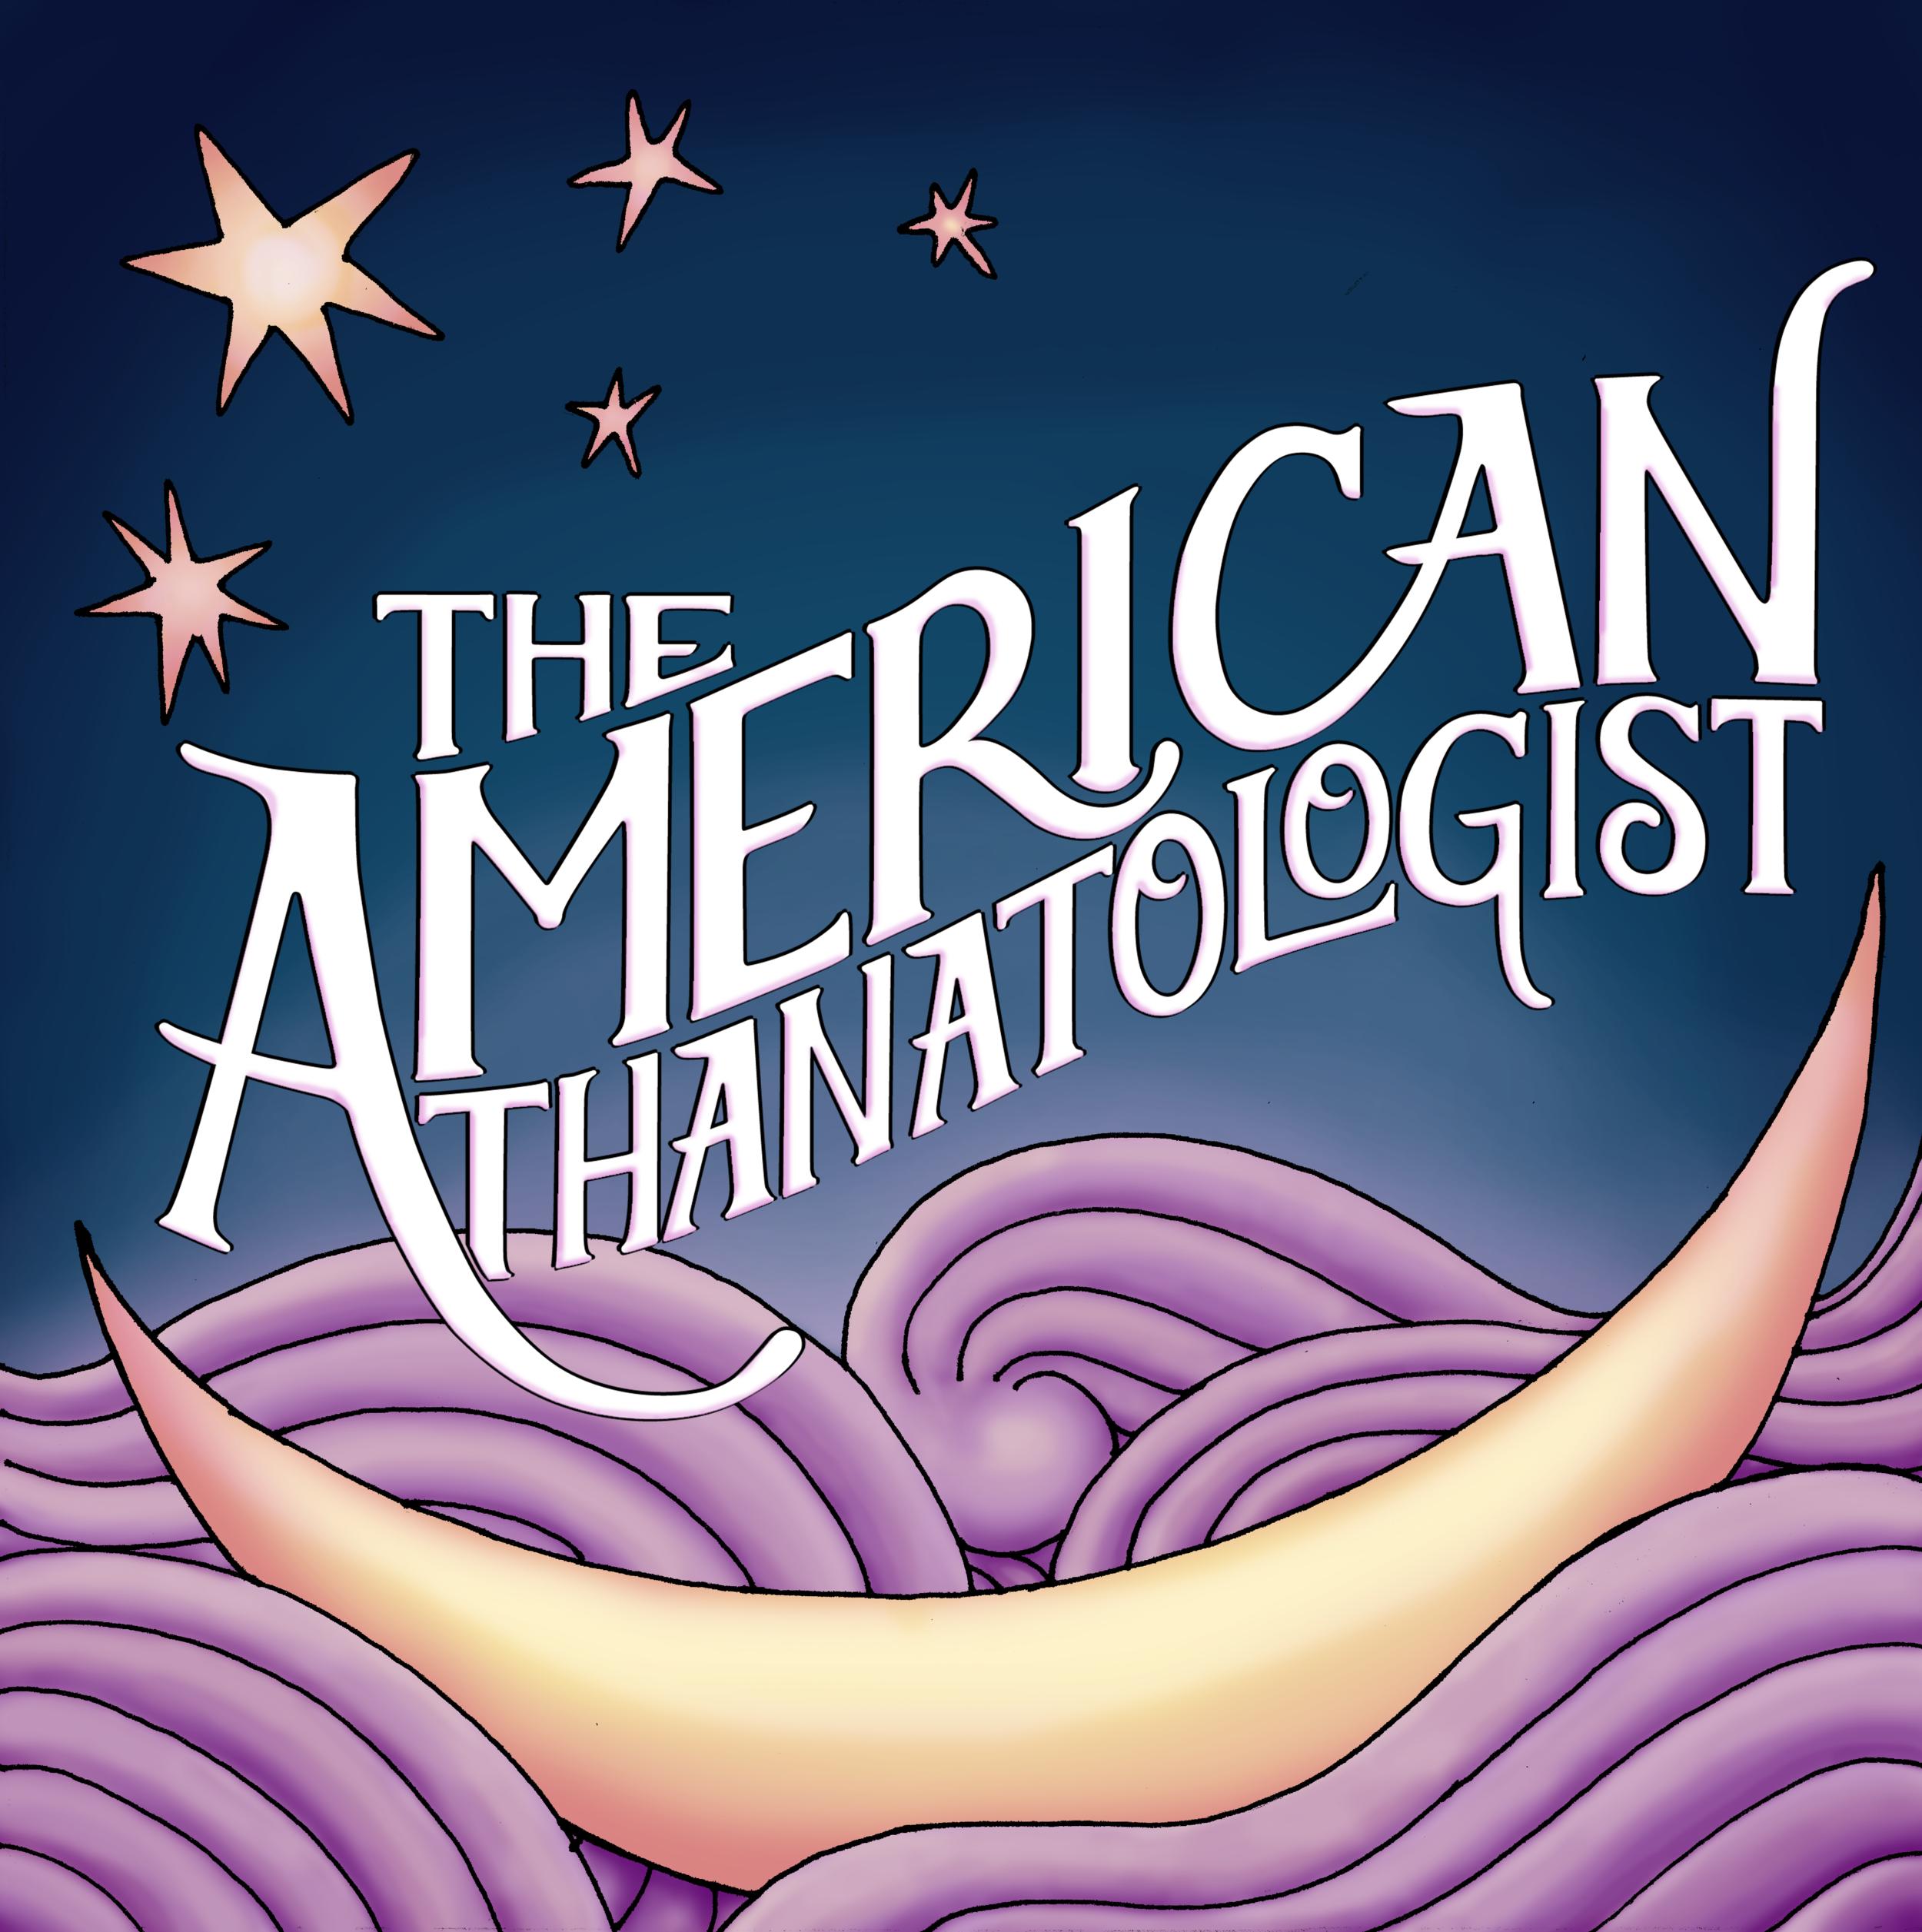 american-thanatologist.png